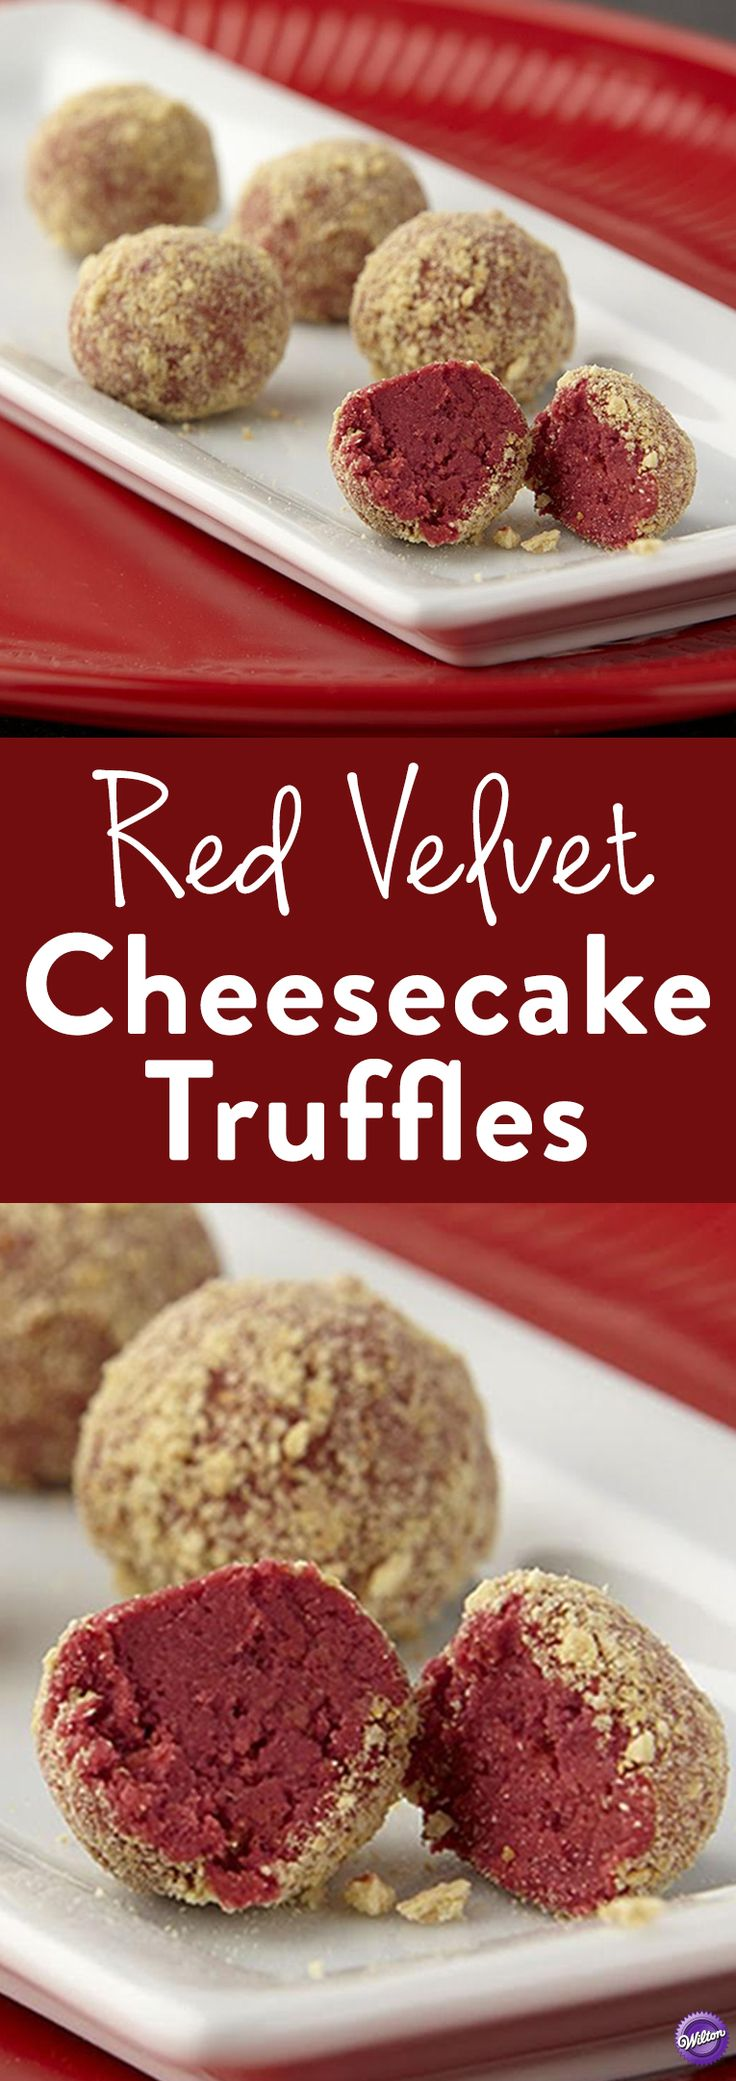 how to make truffles recipe